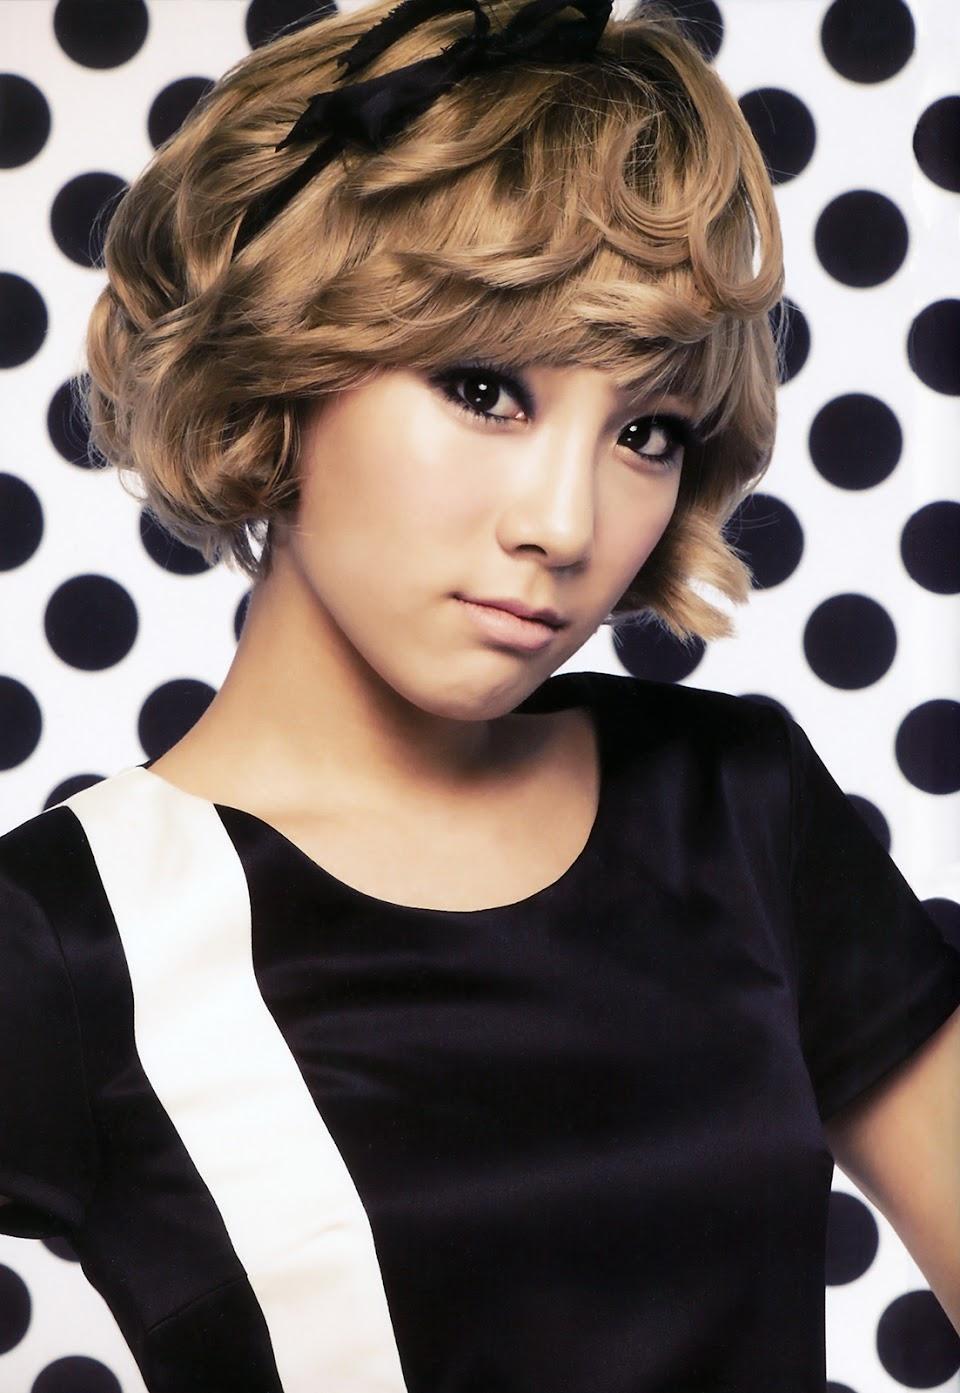 taeyeon hair 19